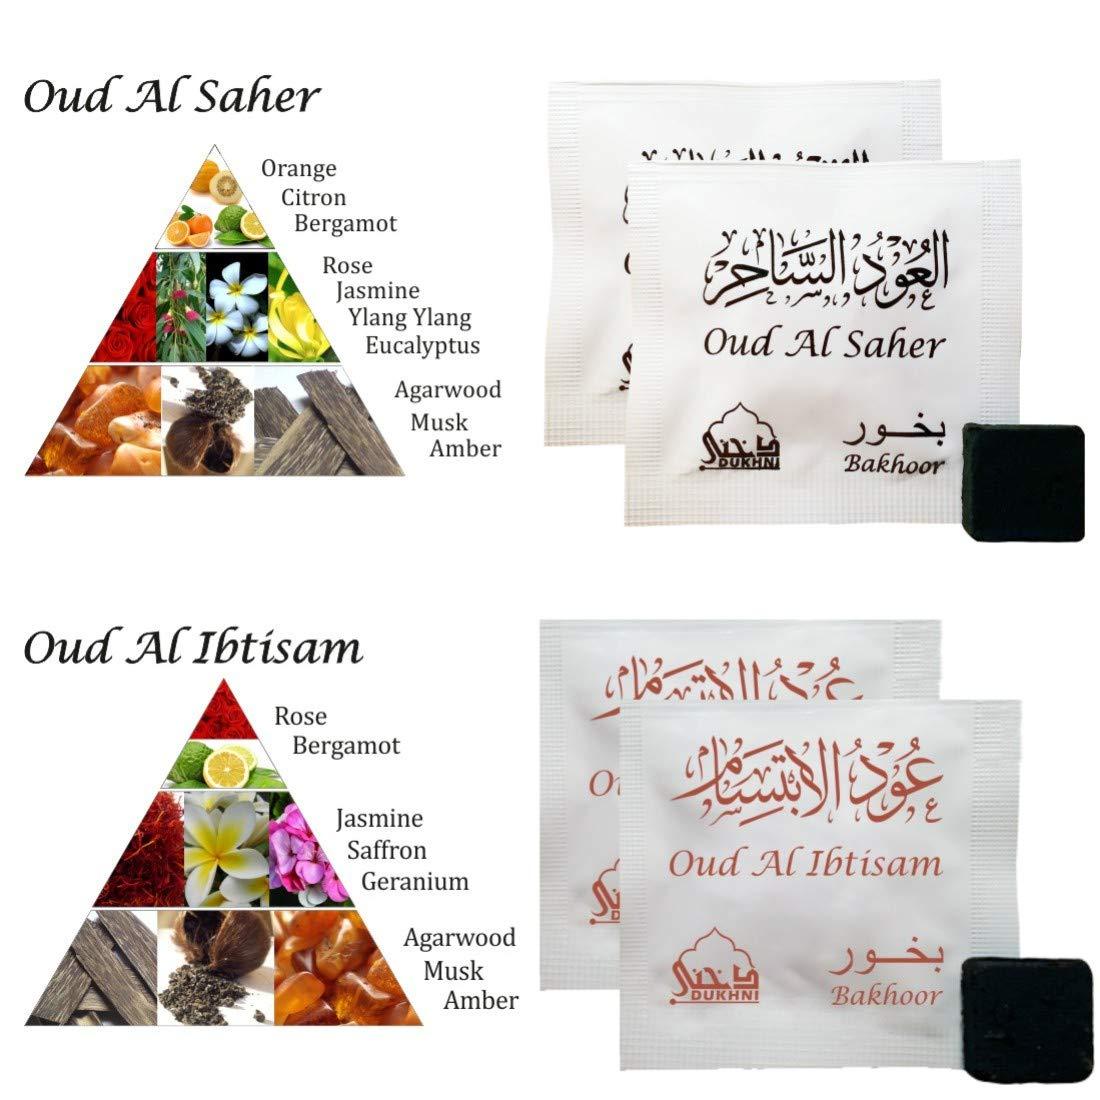 Dukhni Oud Bakhoor Incense Variety Box & Rainbow Bakhoor Burner - Gift Set & Starter Kit by Dukhni (Image #9)